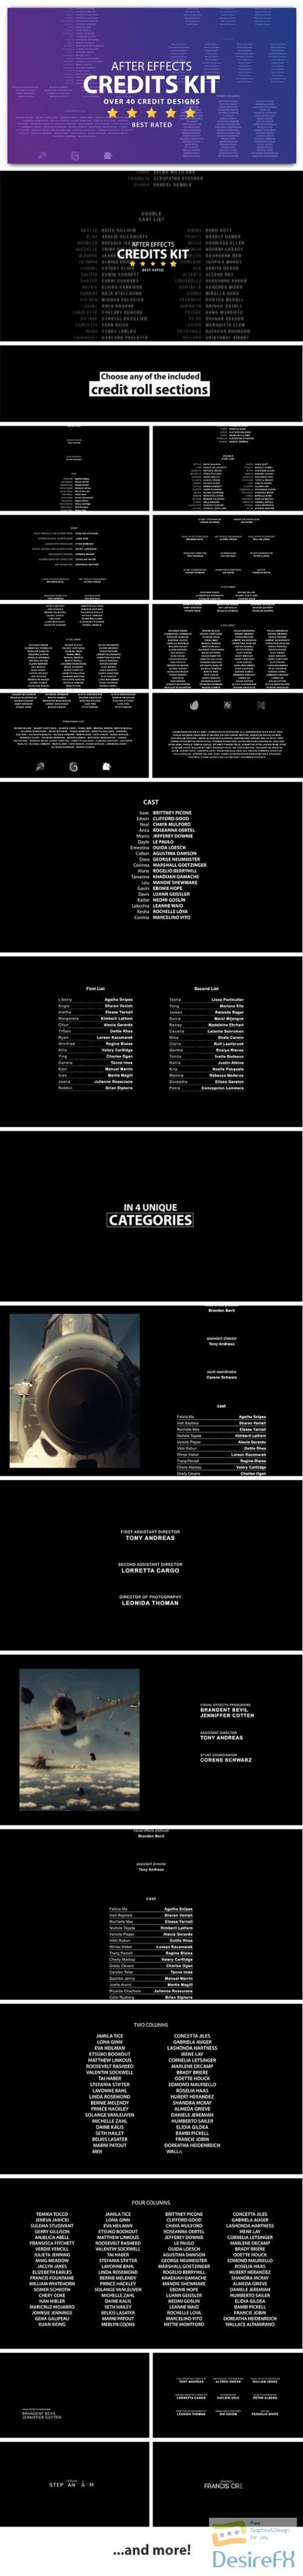 Videohive Cinema Film Credits Pack 8422154